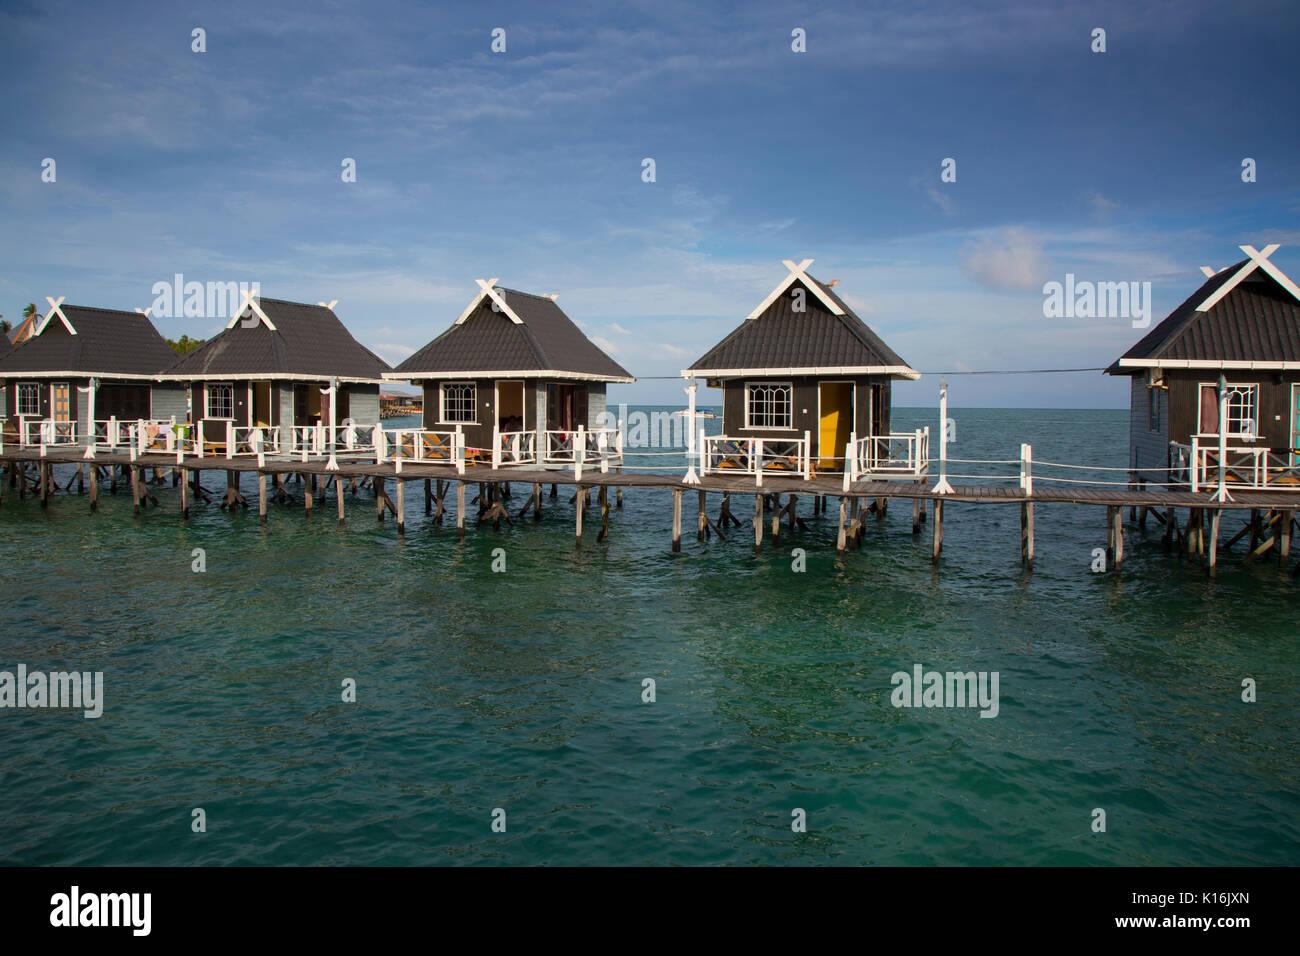 Tourist bungalows over the ocean at Billabong Dive Resort, Mabul Island - Stock Image